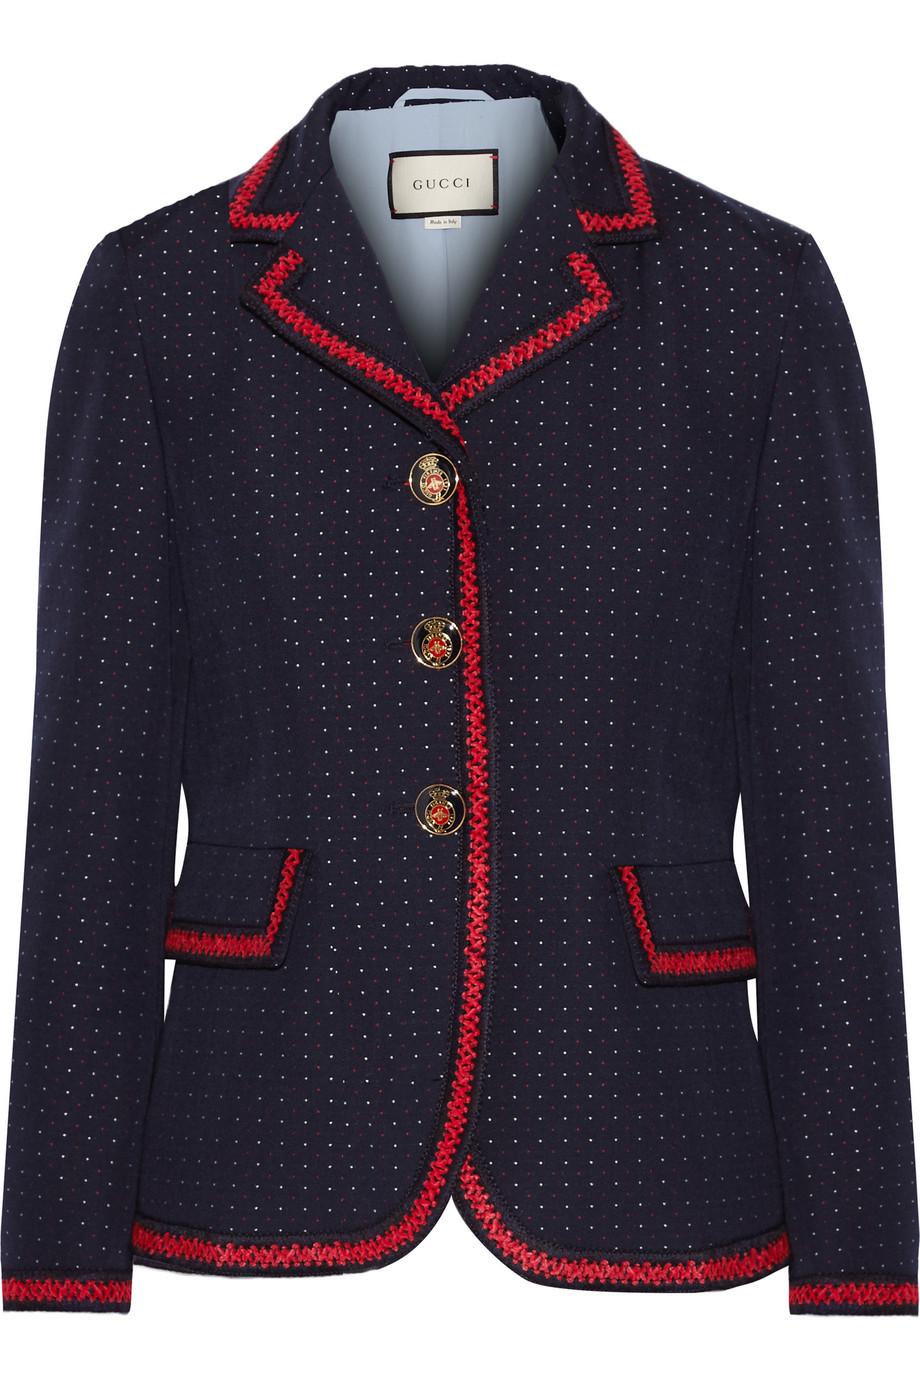 Gucci Velvet-Trimmed Polka-Dot Cotton and Wool-Blend Blazer, Size: 36